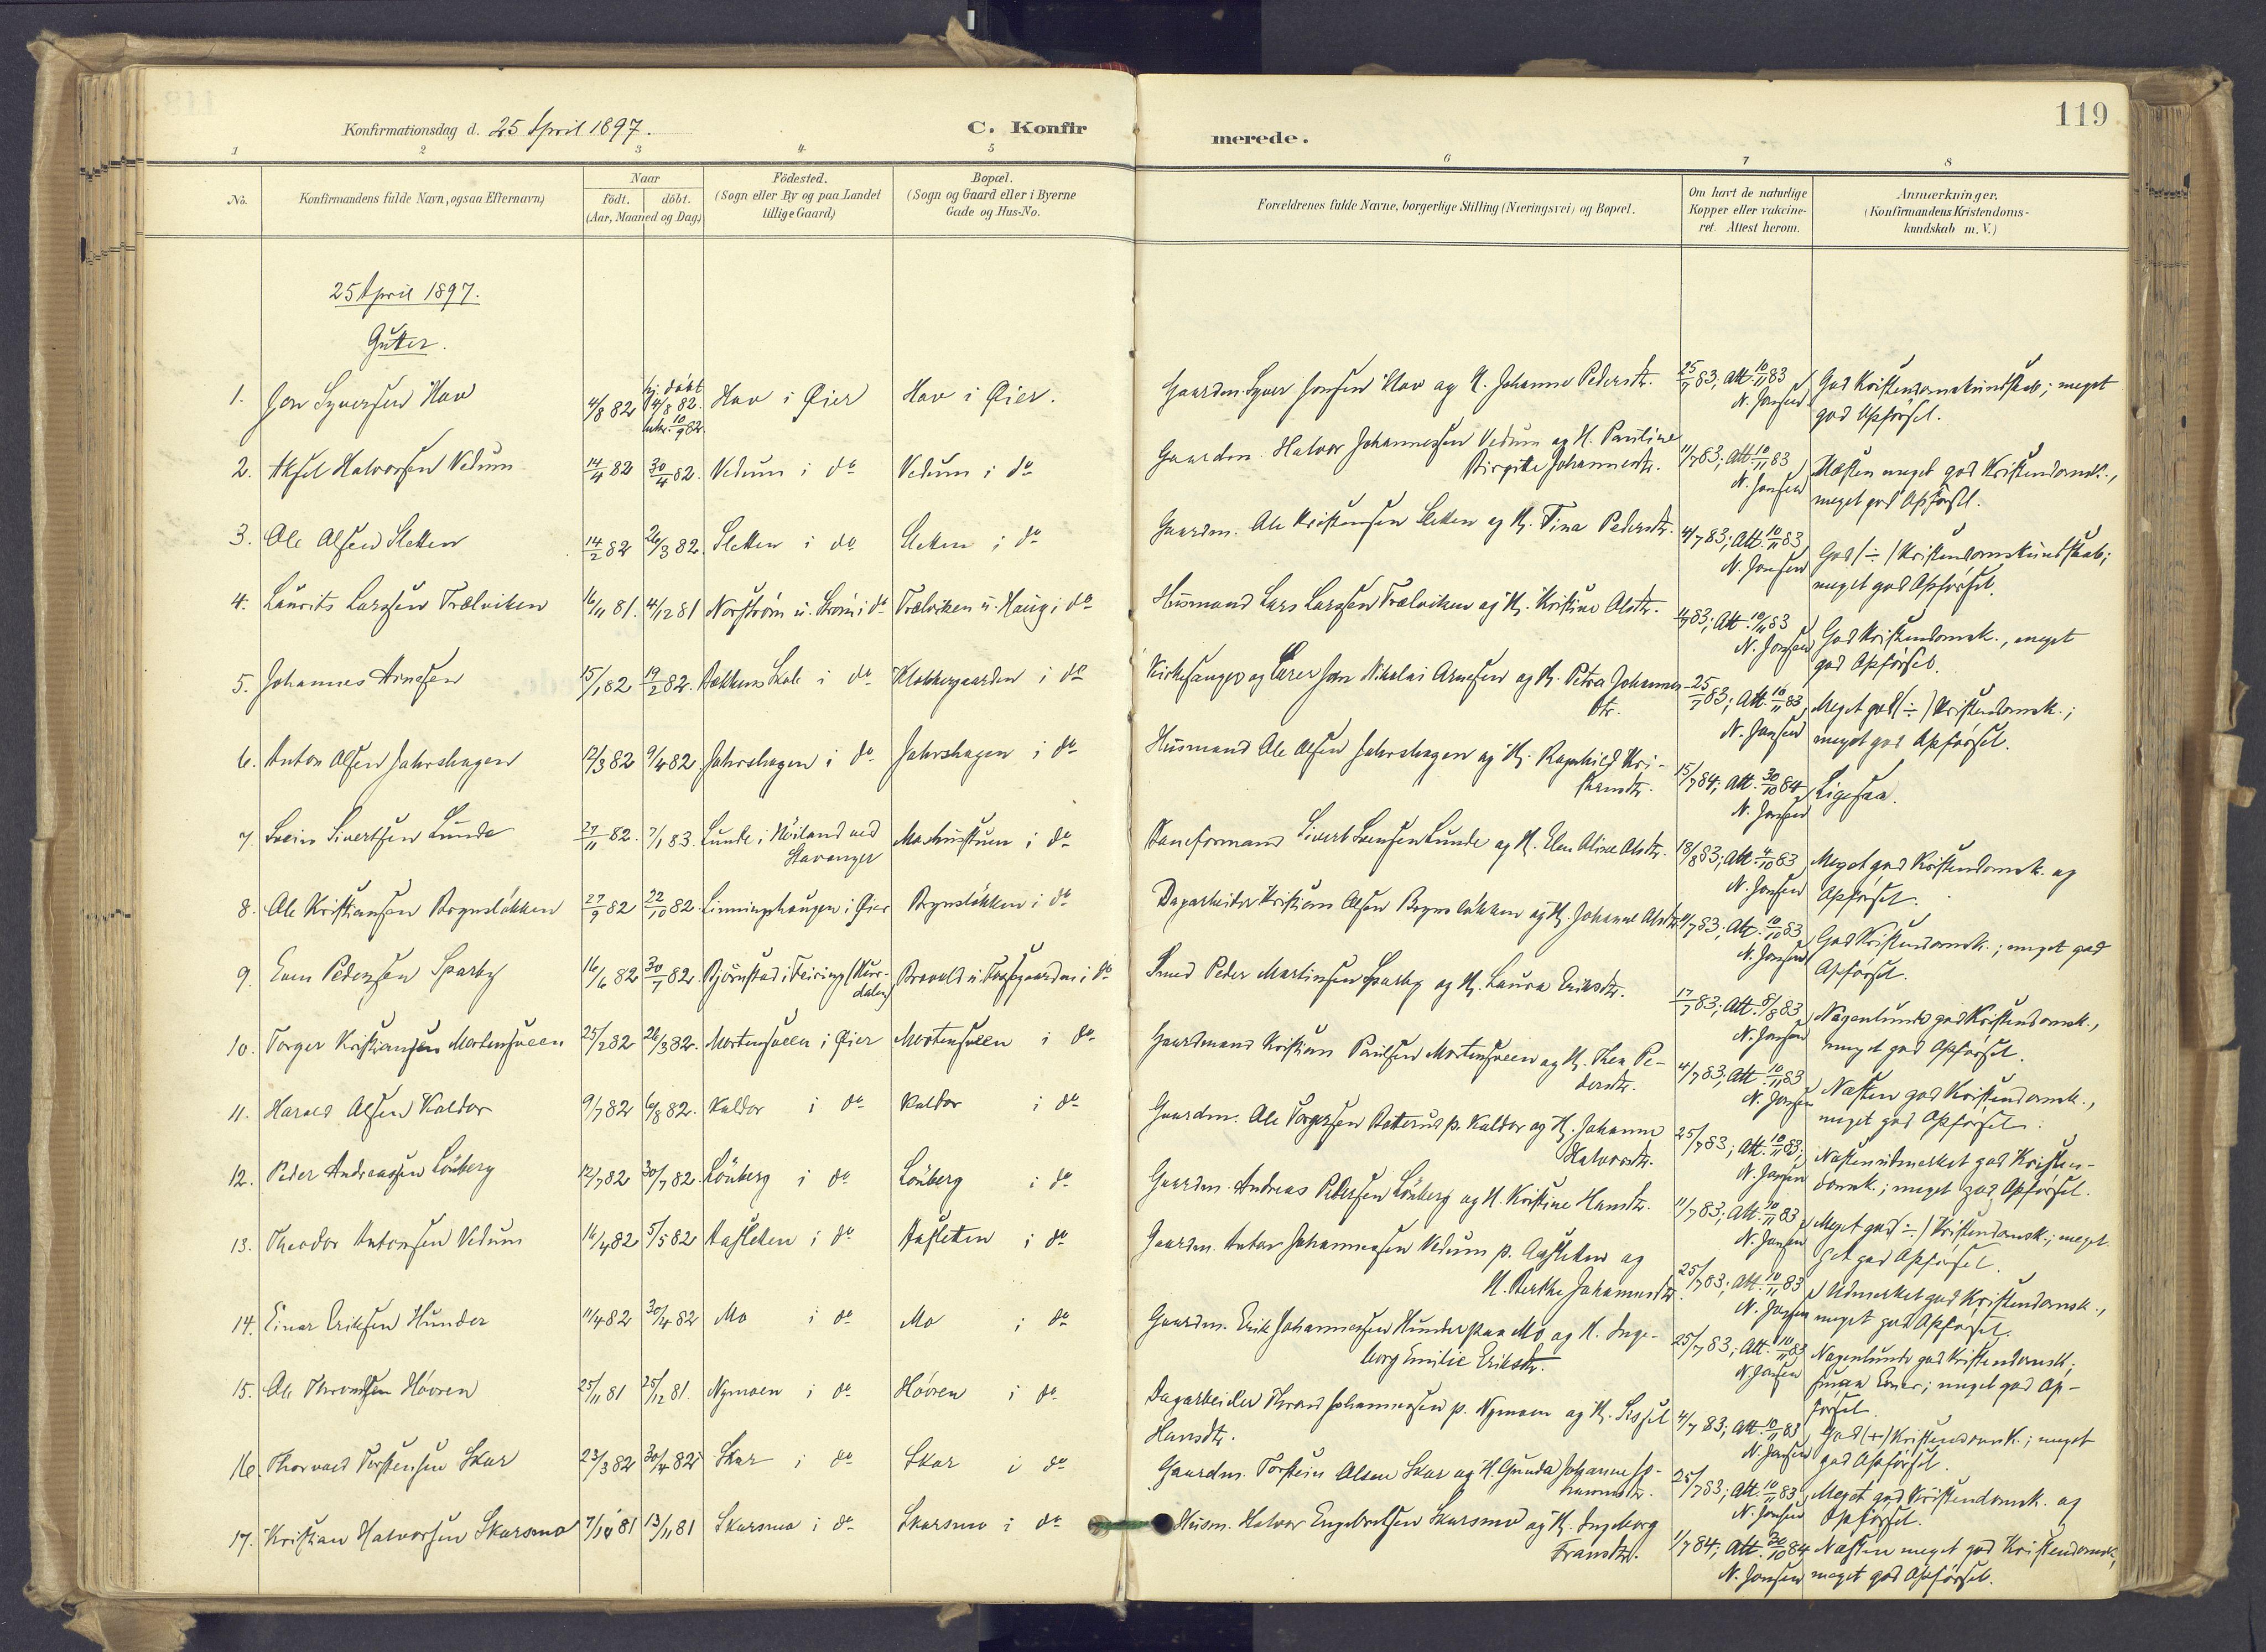 SAH, Øyer prestekontor, Ministerialbok nr. 12, 1897-1920, s. 119